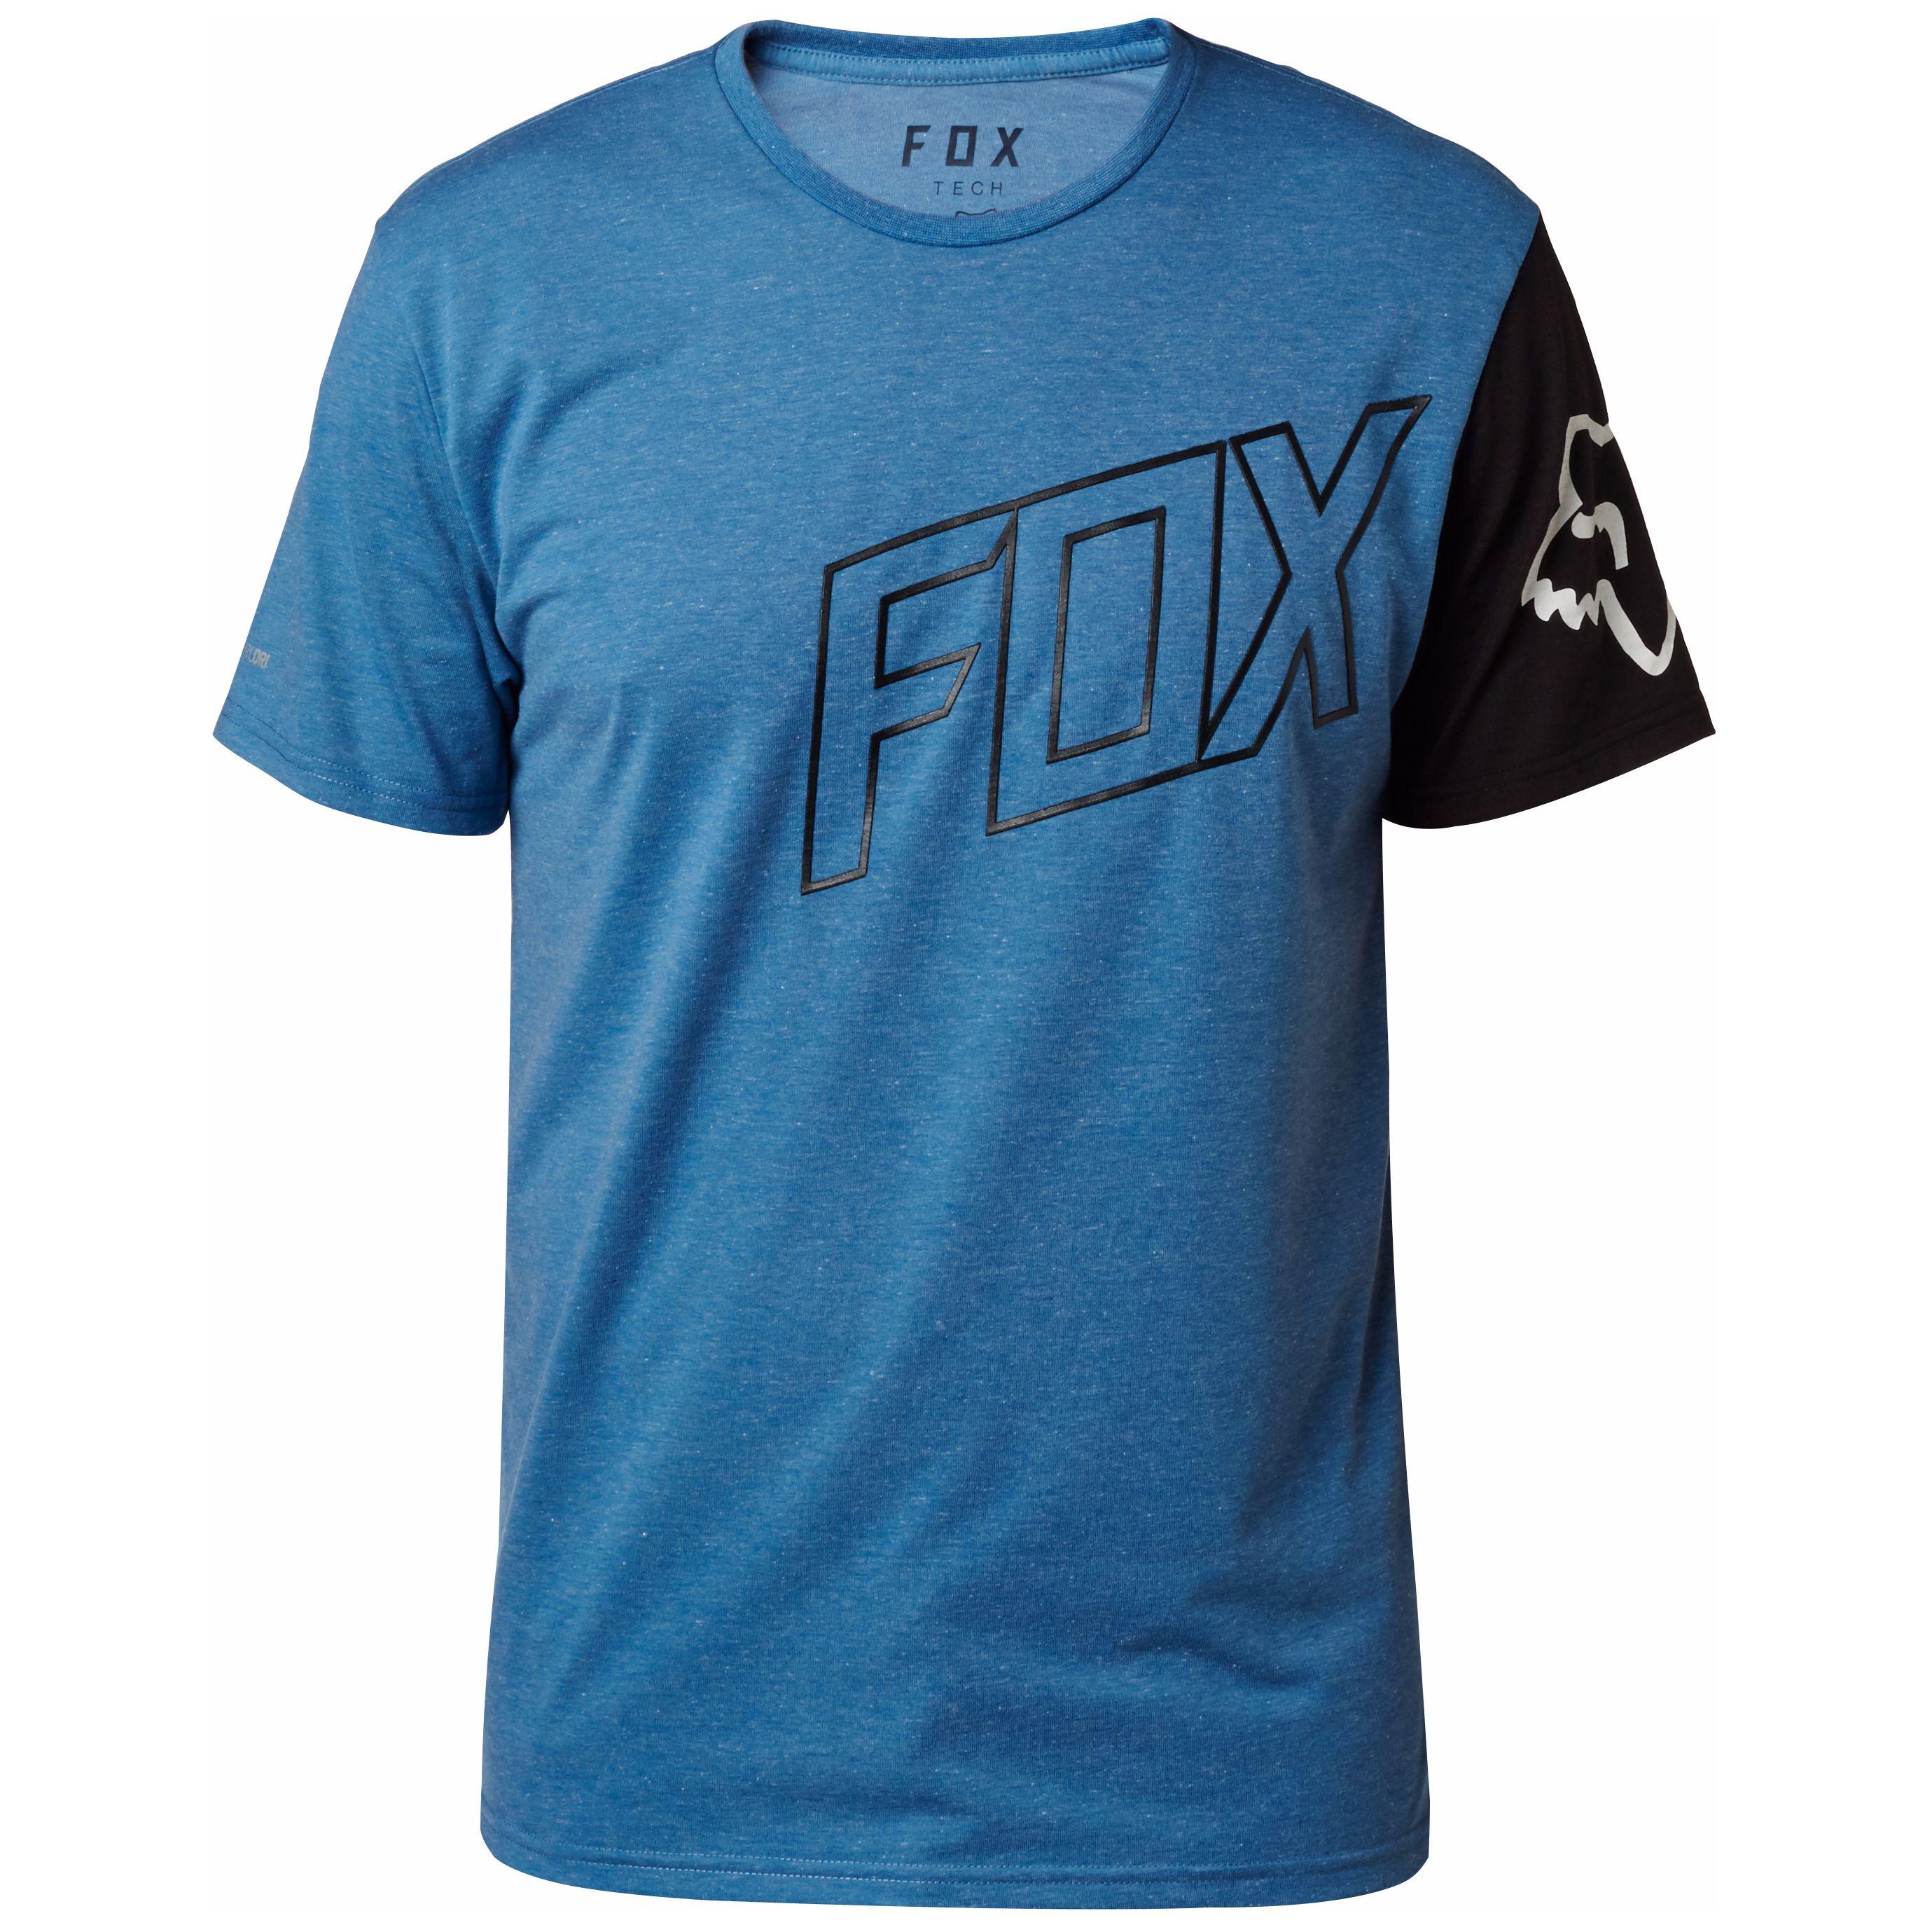 T-shirt Manches Courtes Fox Moto Vation - 2018